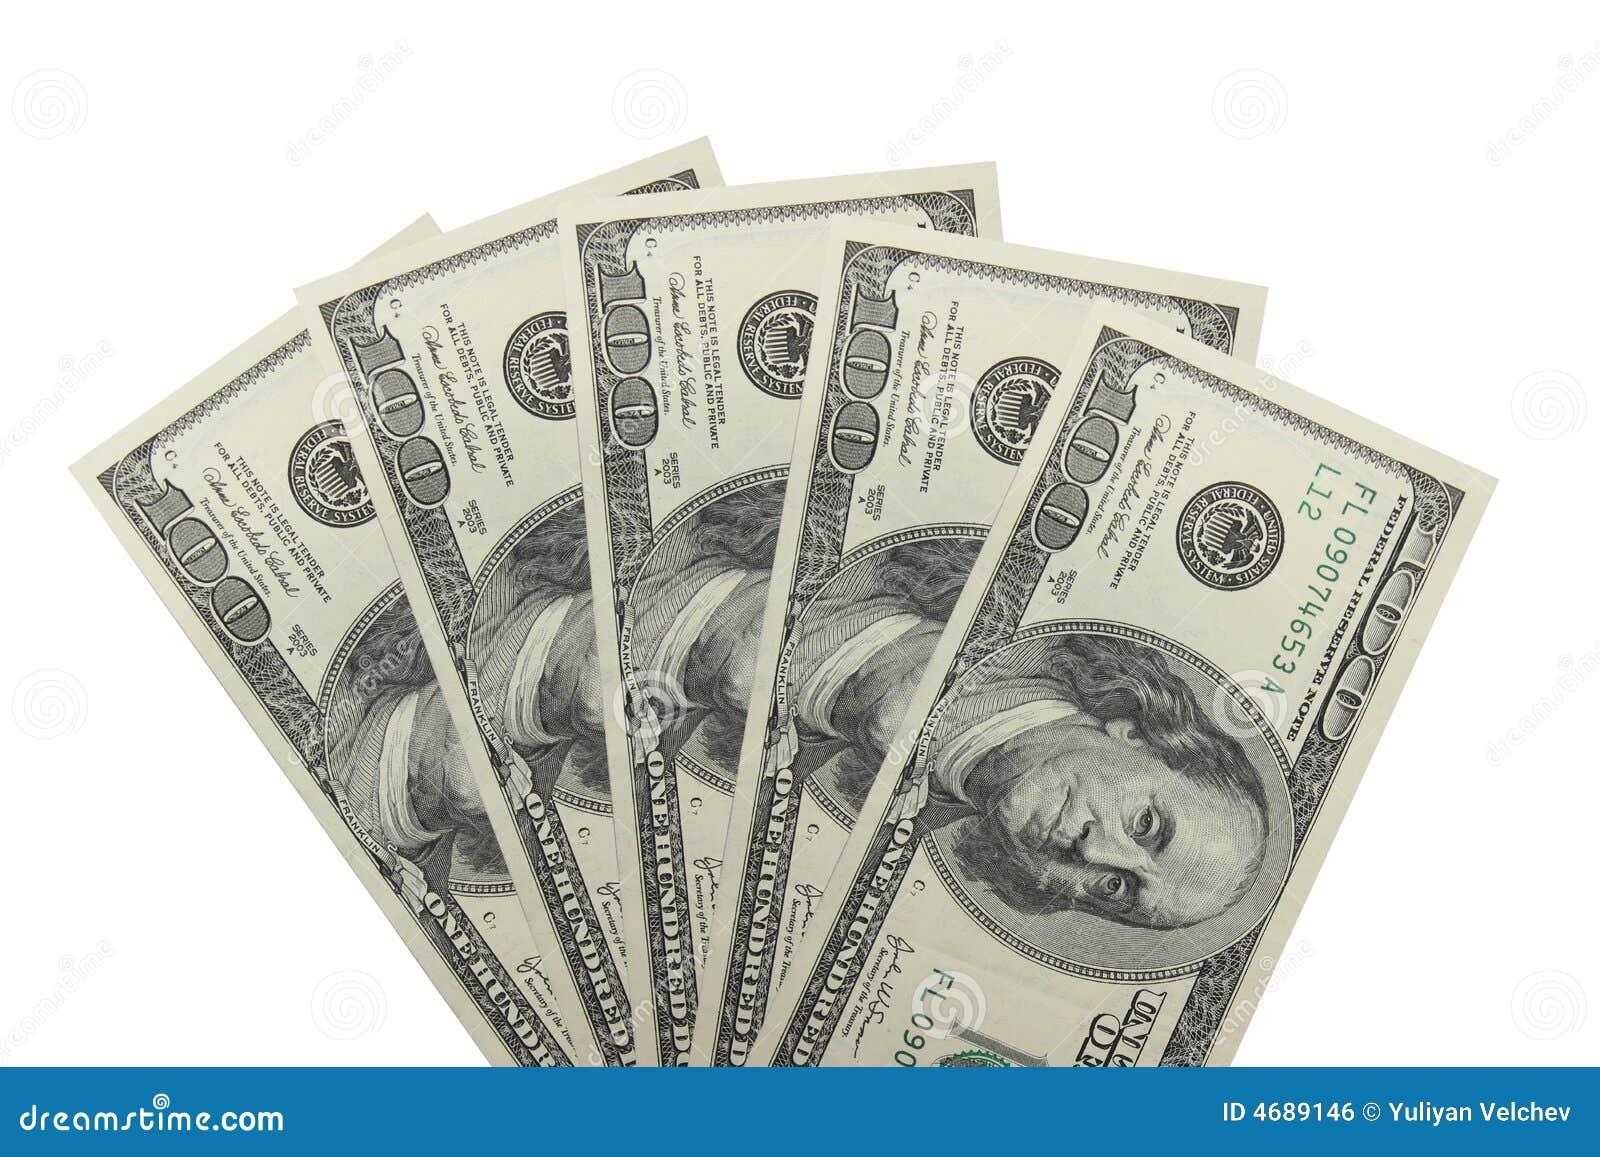 500 dollars royalty free stock image image 4689146. Black Bedroom Furniture Sets. Home Design Ideas